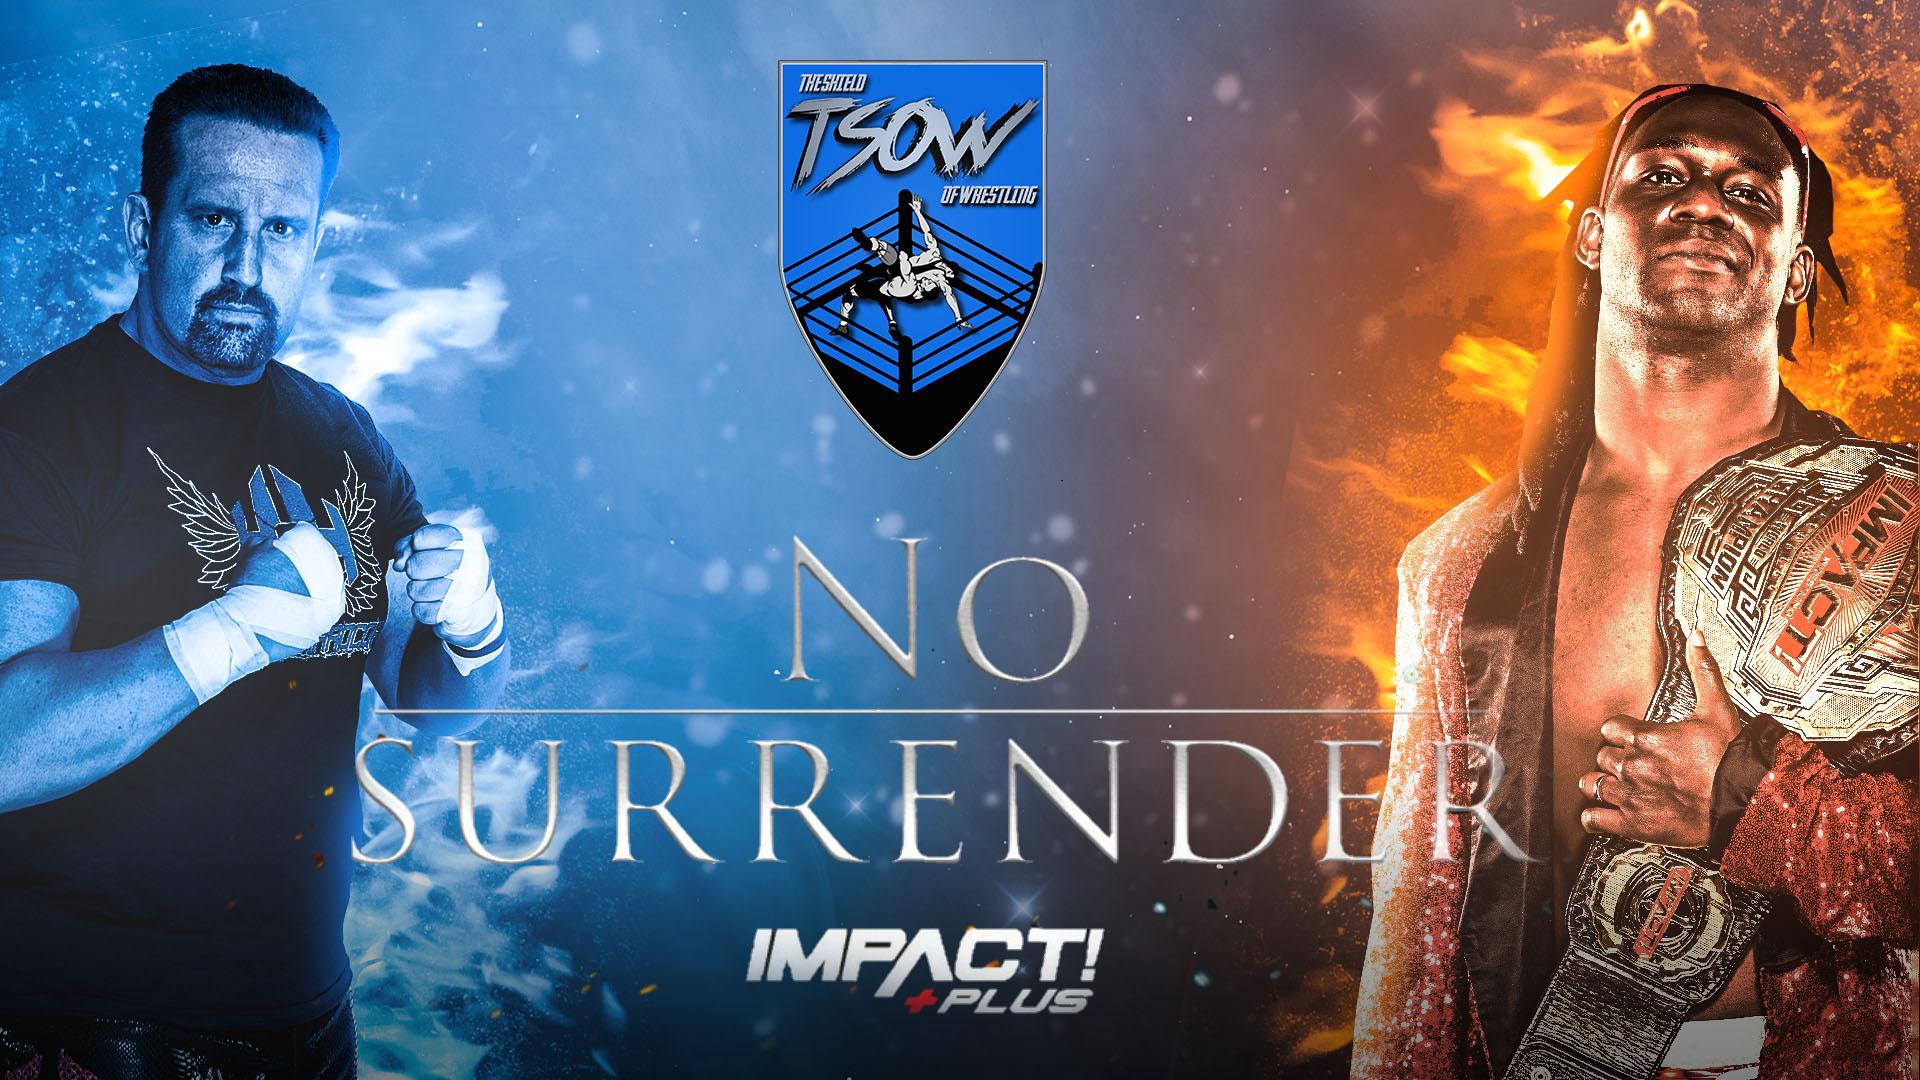 No Surrender: chi ha vinto tra Rich Swann e Tommy Dreamer?